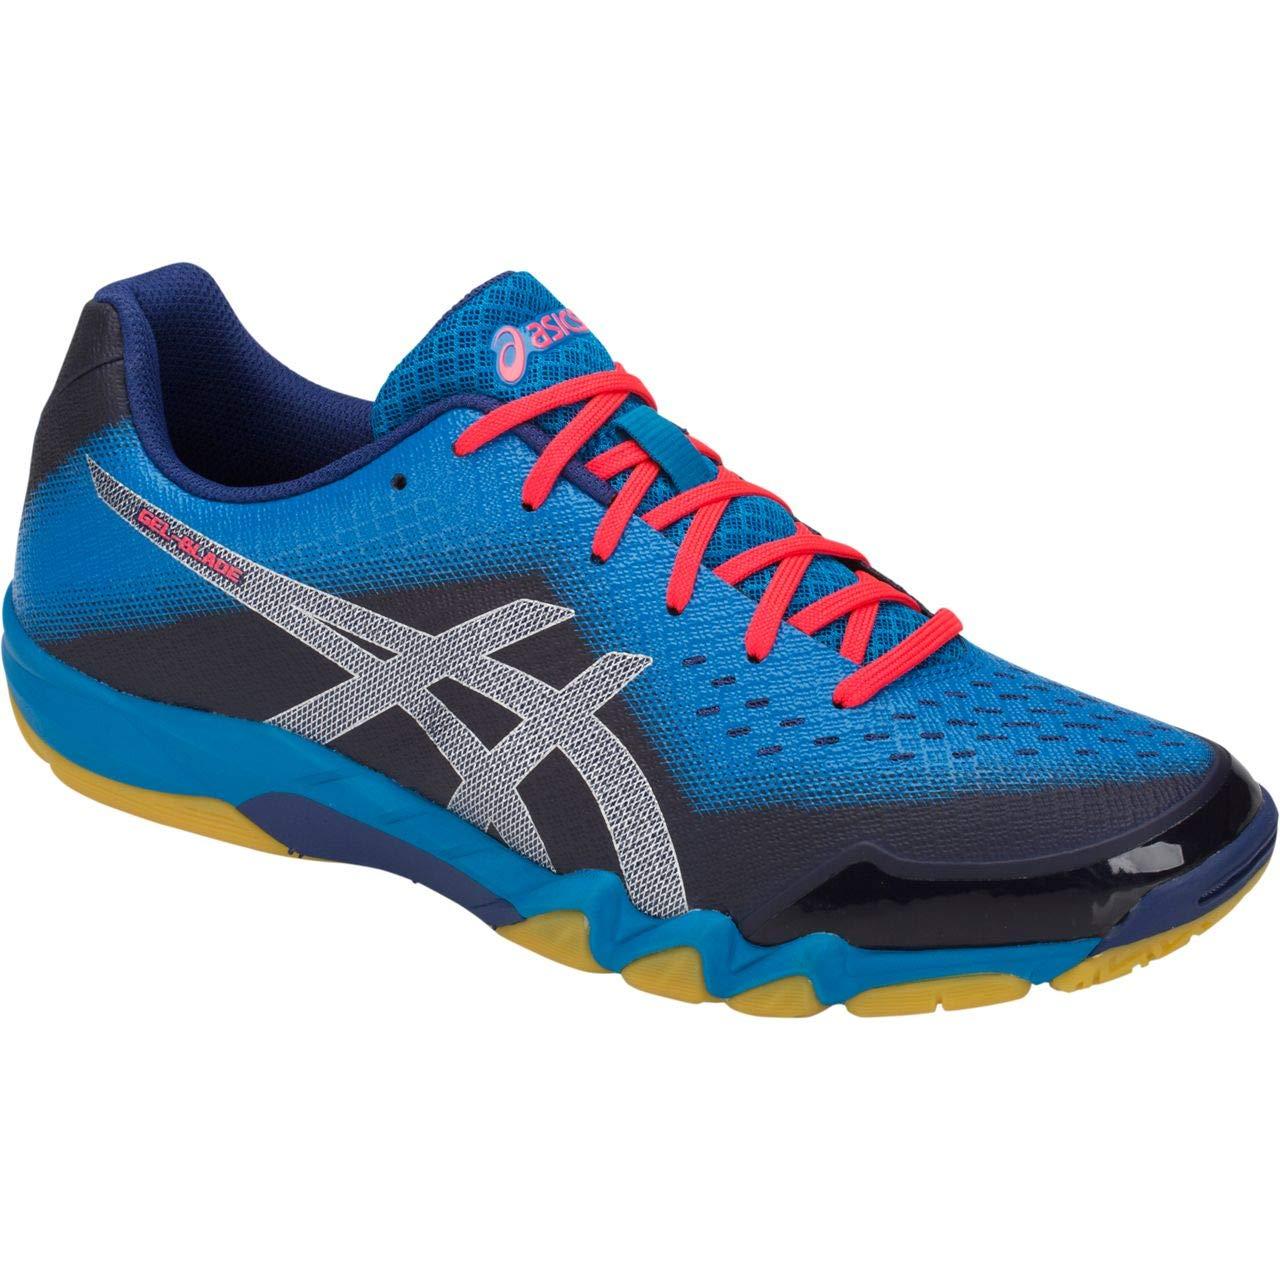 ASICS Gel Blade 6 Mens Indoor Court Shoe (Blue Print/Race Blue) (7)